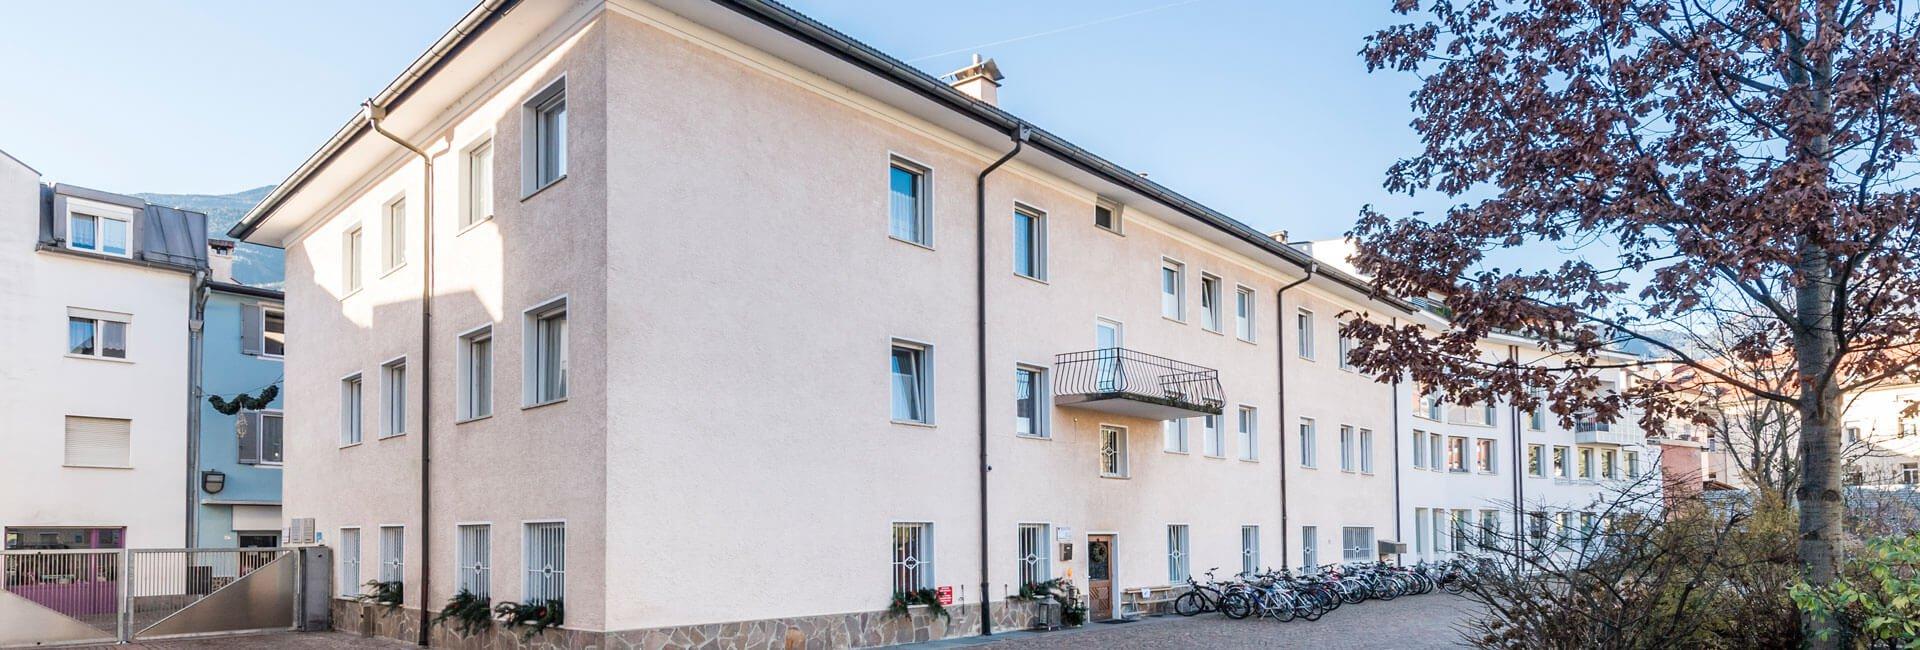 kolpinghaus-brixen-06